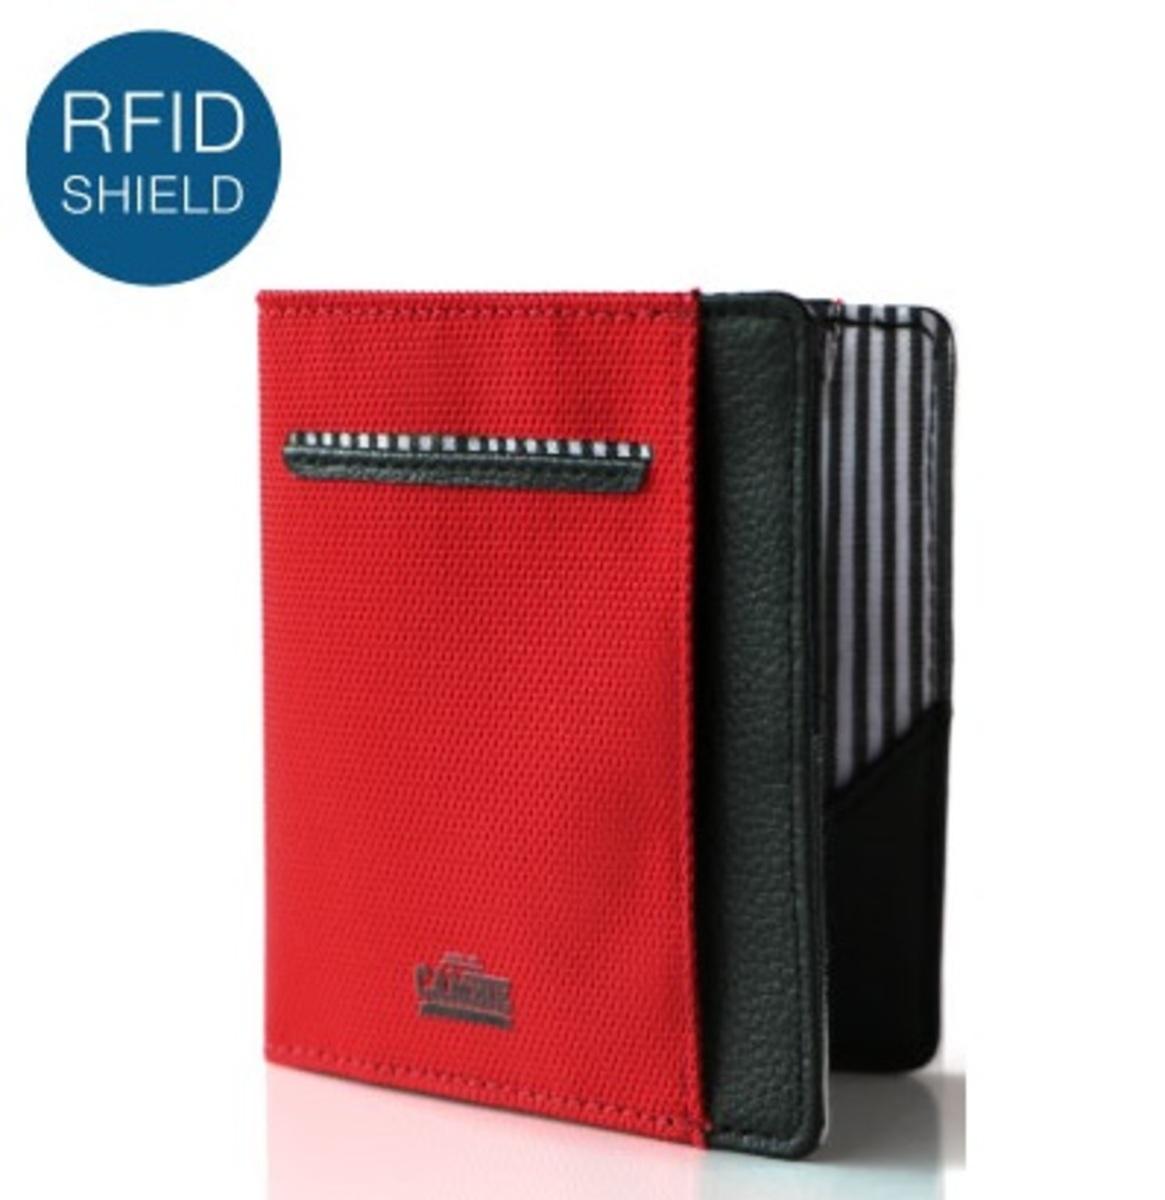 RFID 錢包 紅色 / 黑色 FLIP WOLYT 禮盒裝